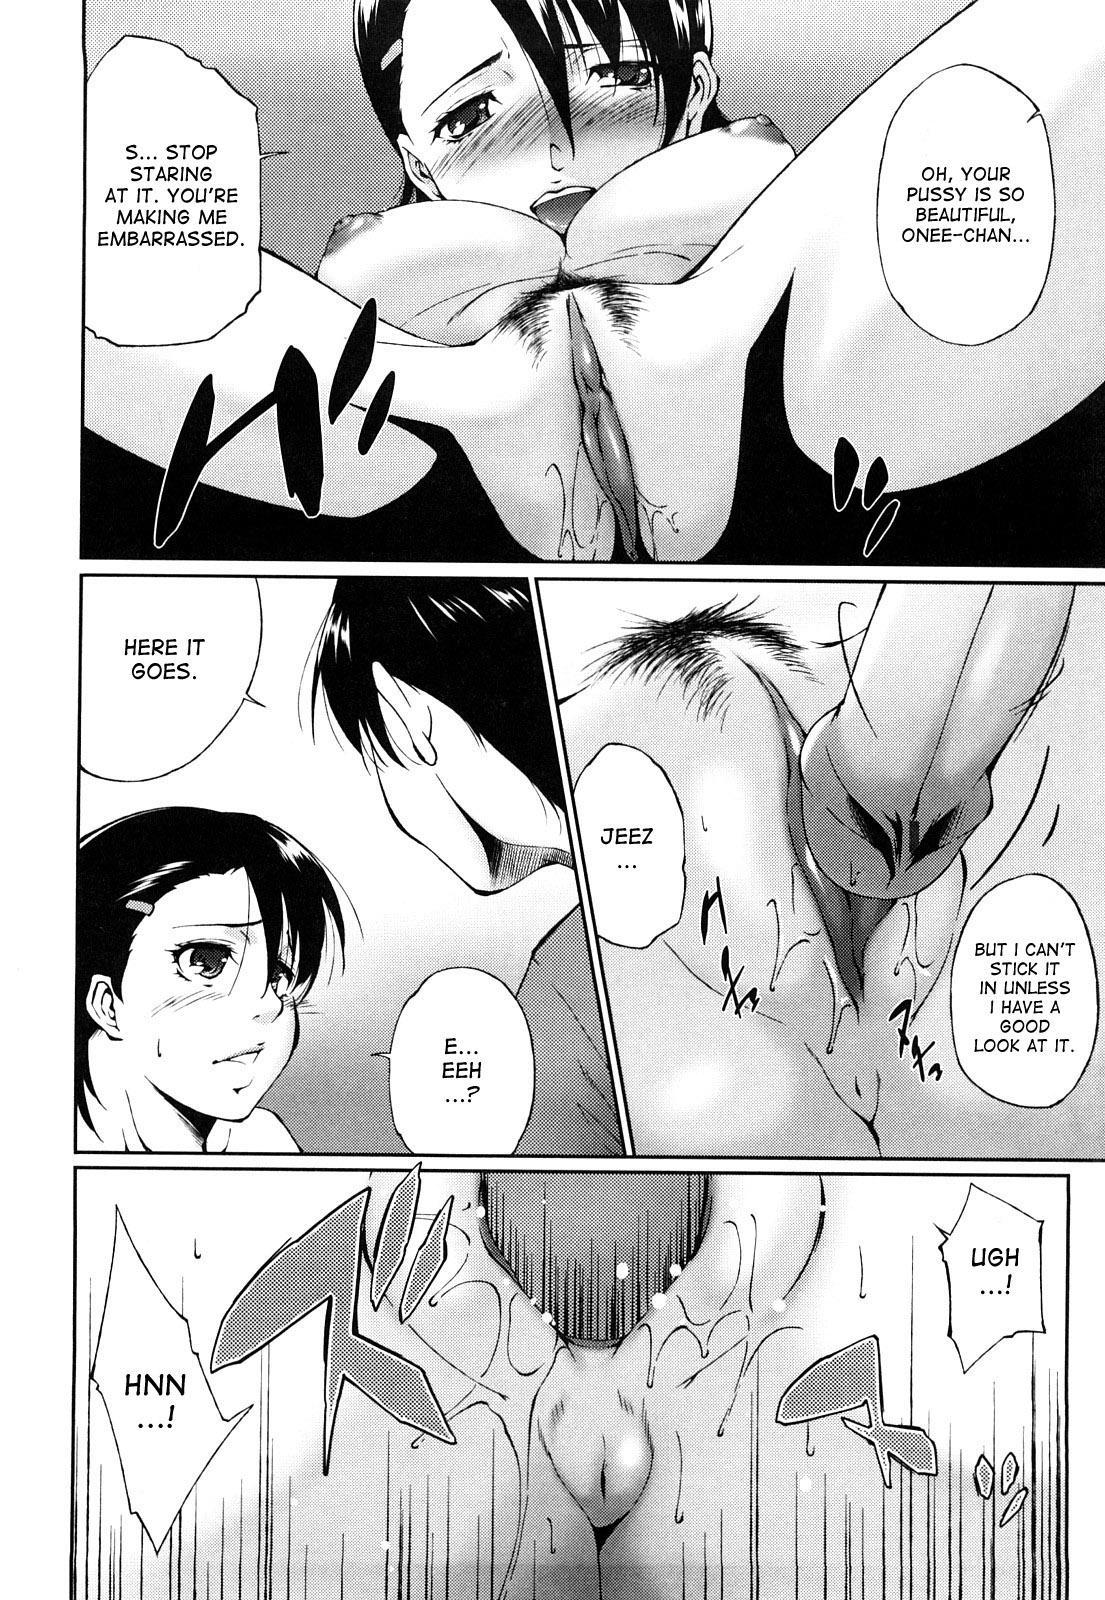 [Touma Itsuki] Ane-sama Inkou - Sister's Sexy Smell Ch. 1-6 [English] [desudesu] [Decensored] 59